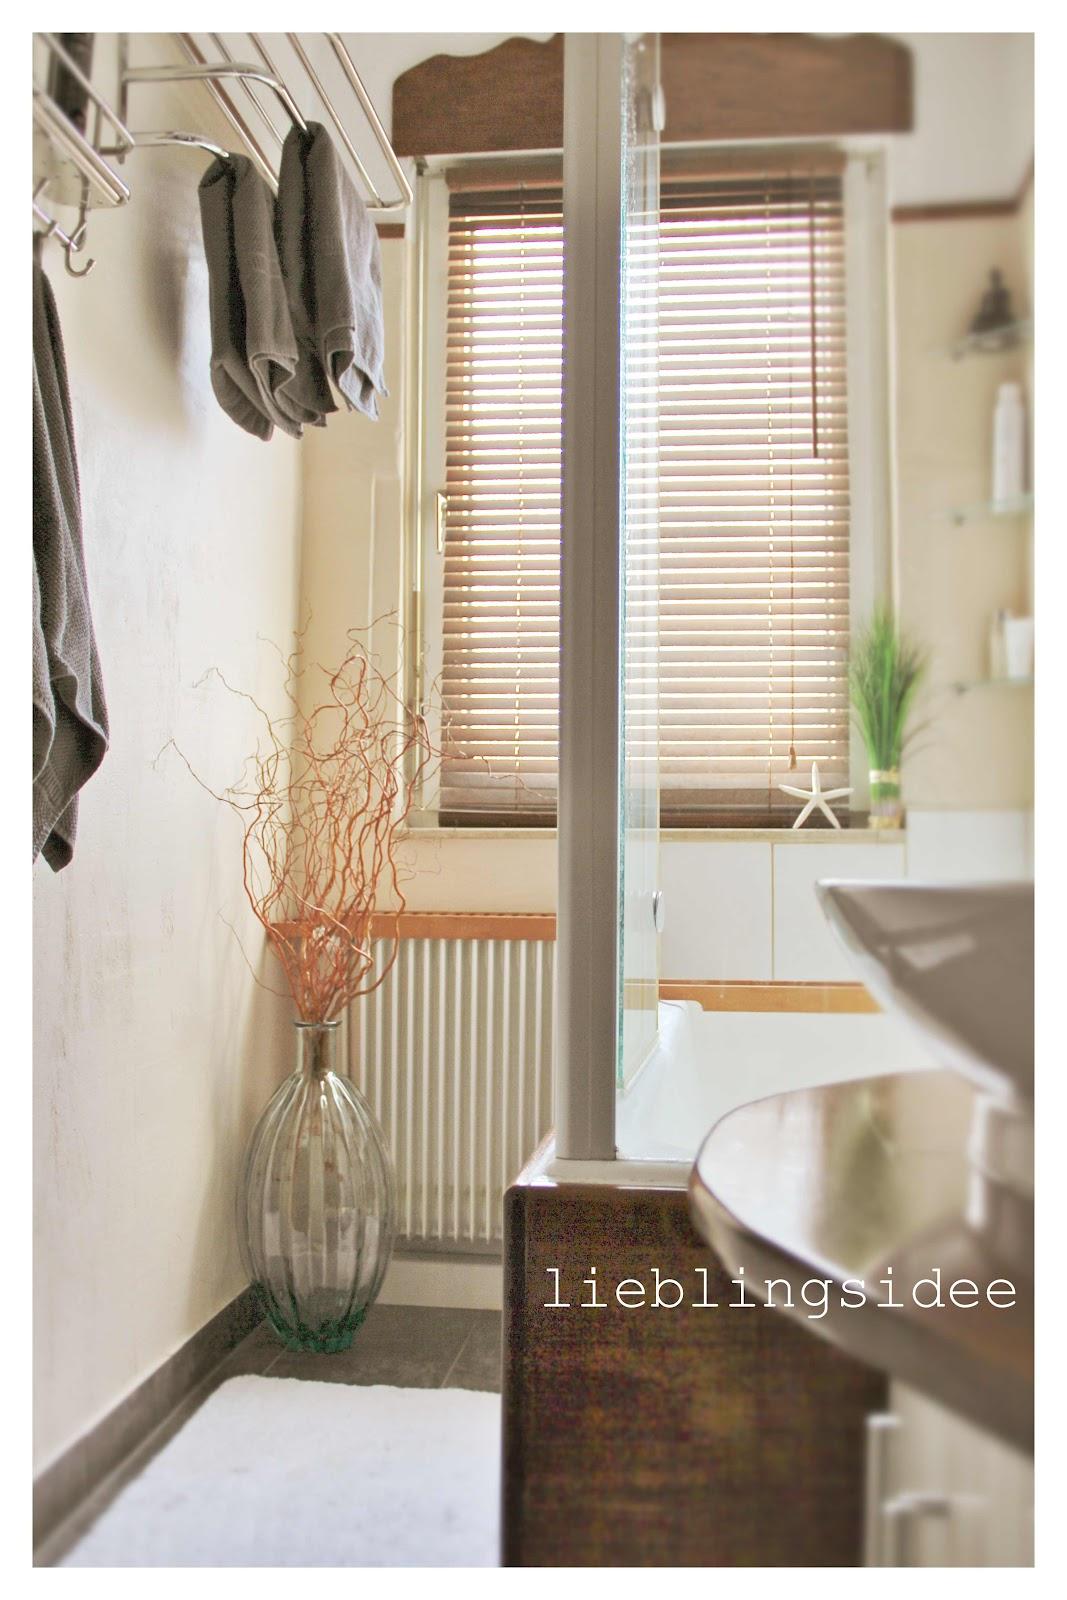 Lieblingsidee Ein Badezimmer Im Kajutenlook Aus Alt